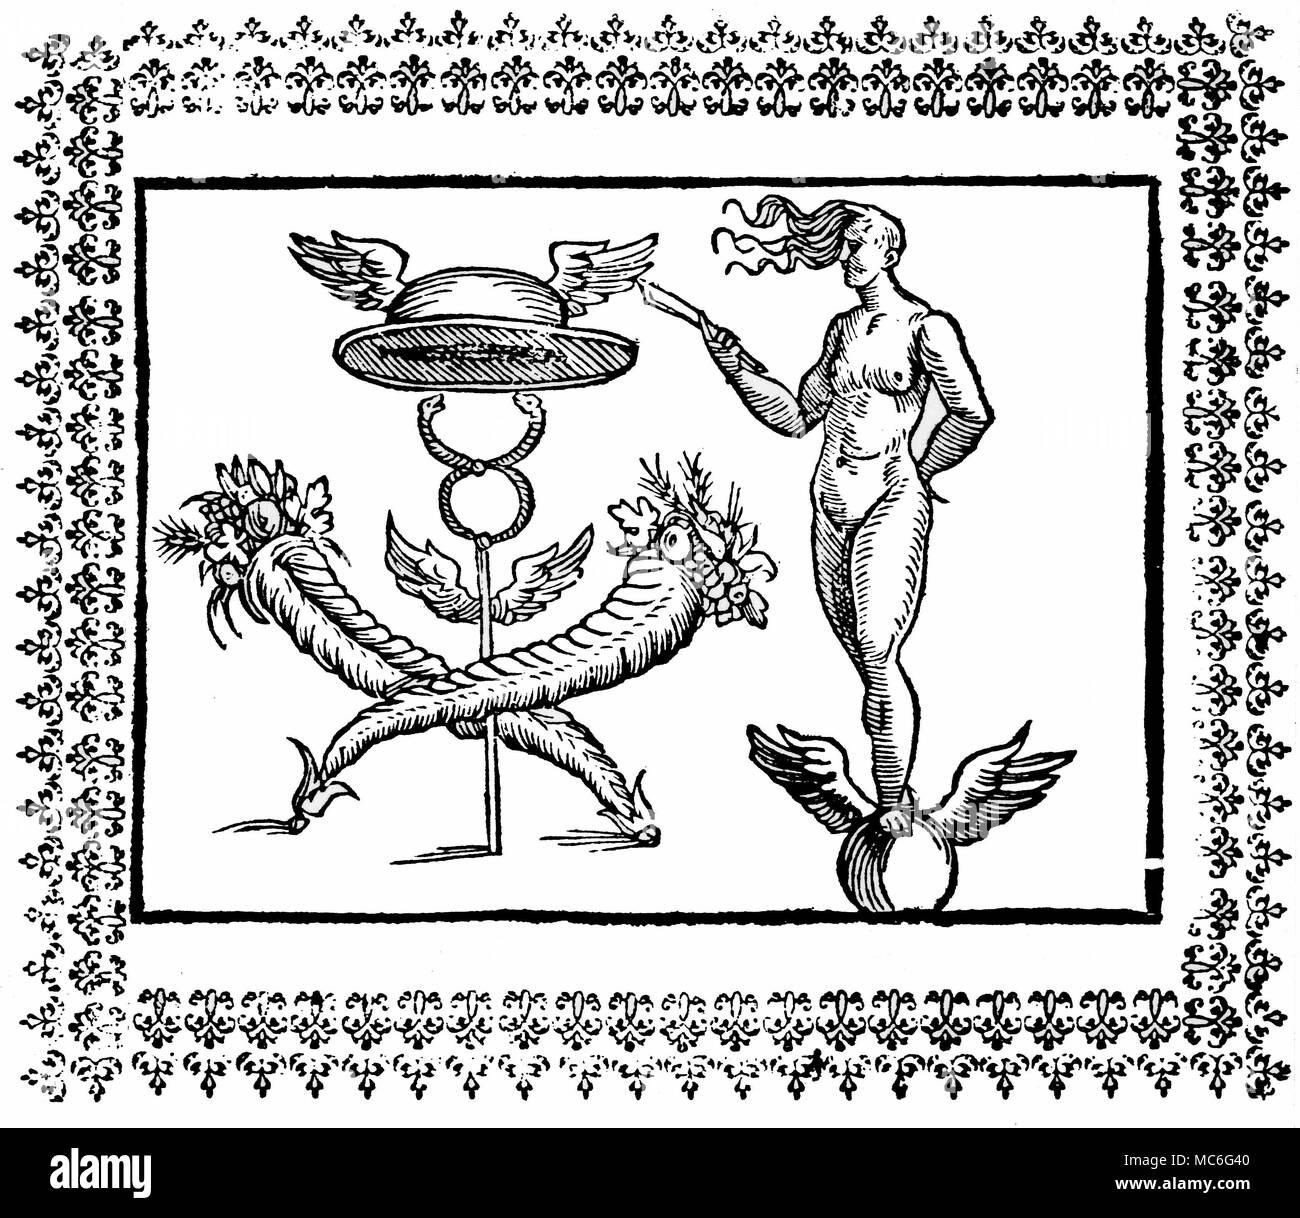 Greek Mythology Fortuna Symbols Hieroglyphic Figure Denoting